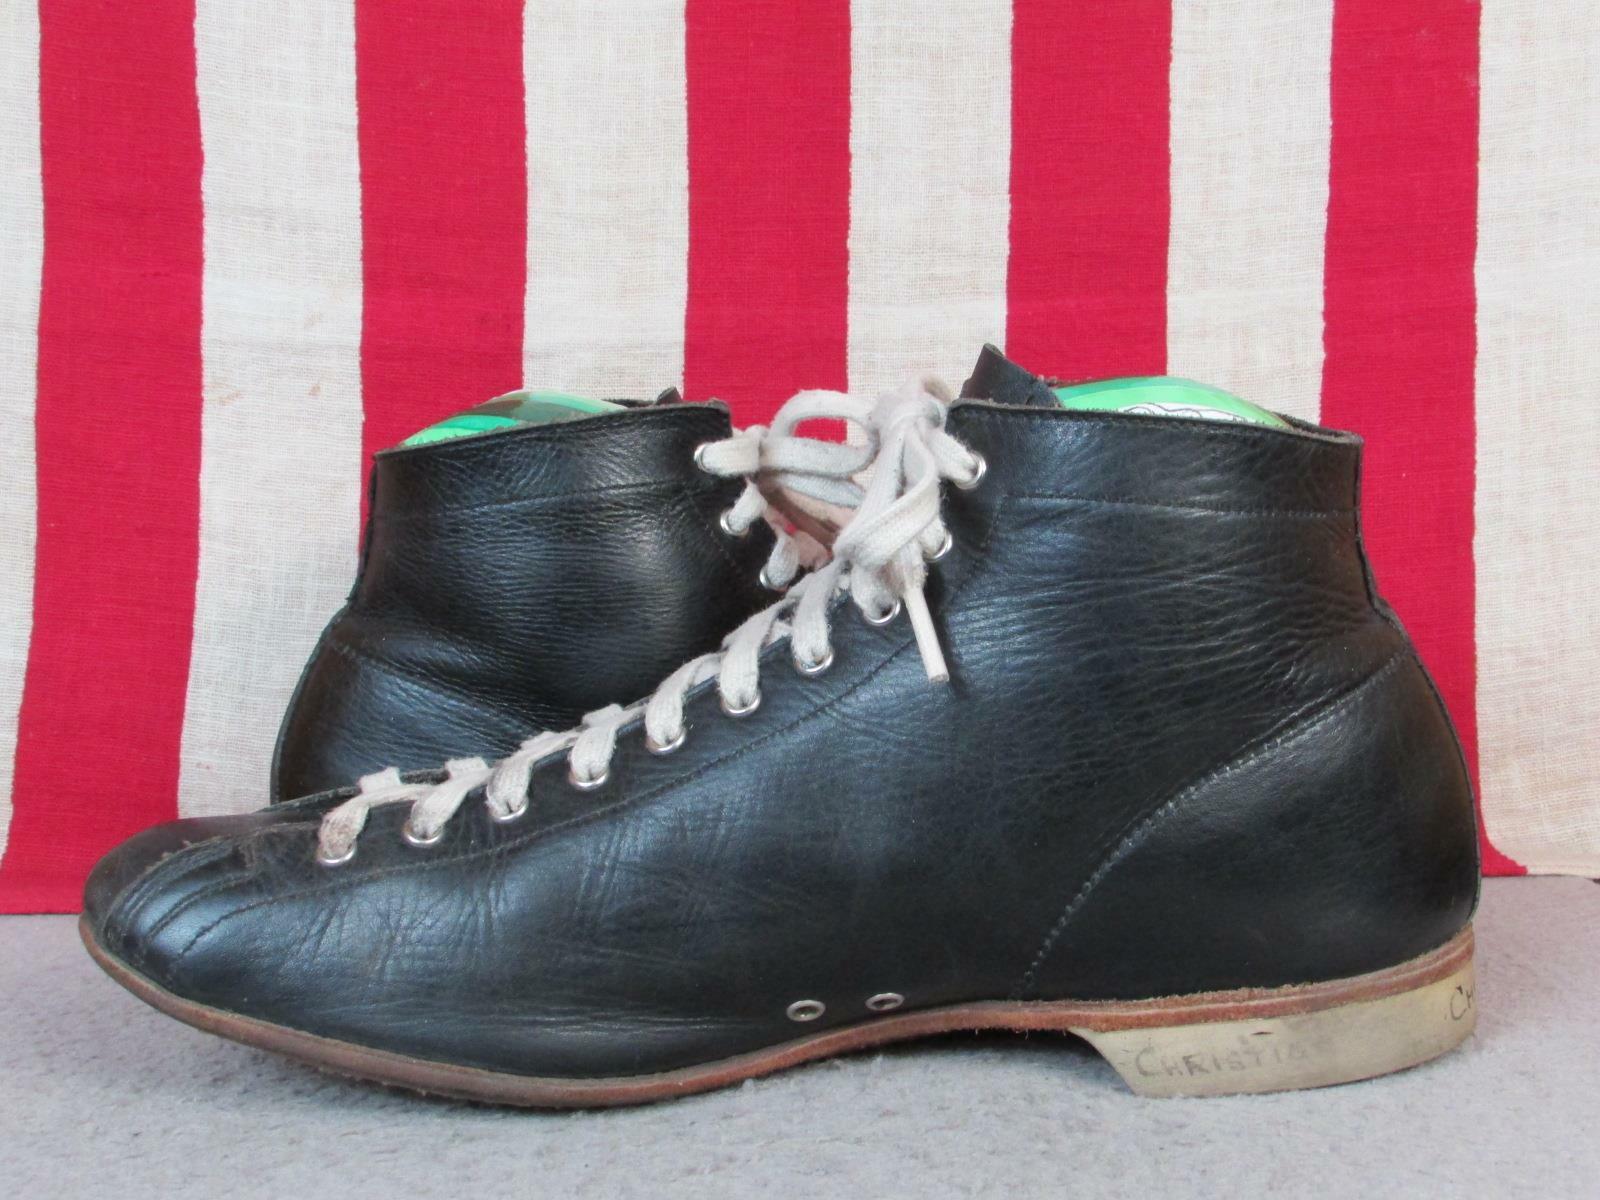 Vintage 1930s Black Leather High Top Athletic Sho… - image 3